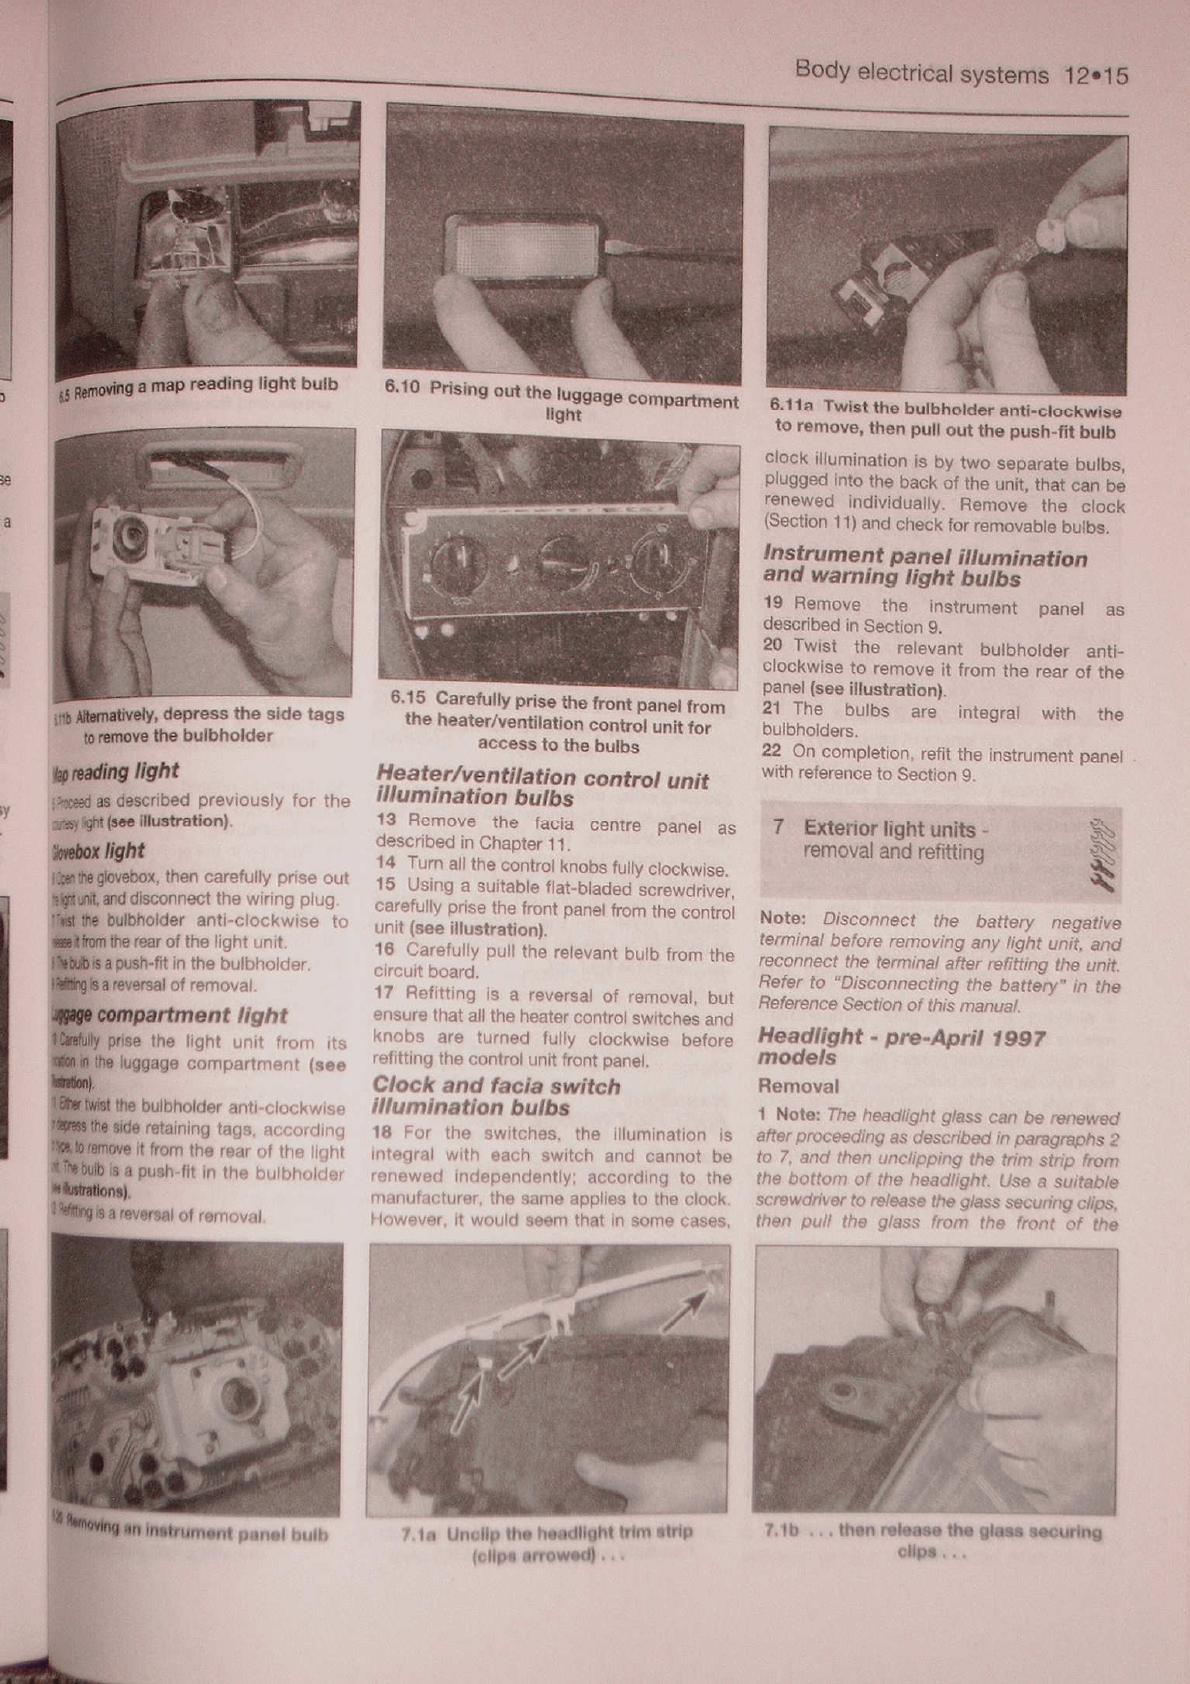 Peugeot 306 Workshop Manual Haynes Pdf Munkaasztalok Pinterest Wiring Diagram Download Atelier